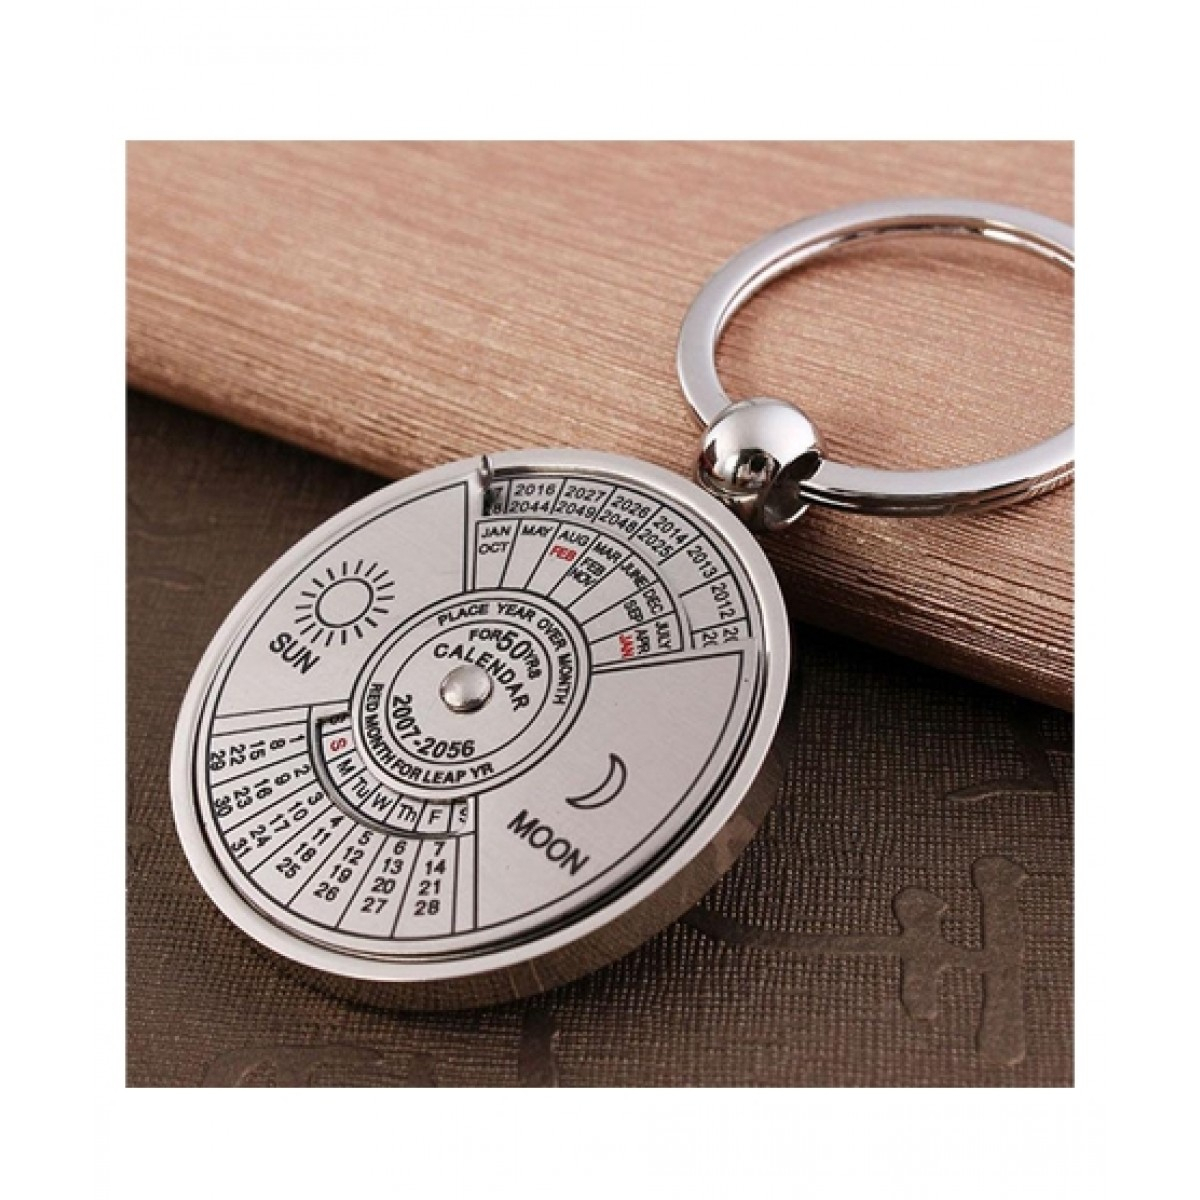 Saad Traders Metal Perpetual Calendar Key Chain